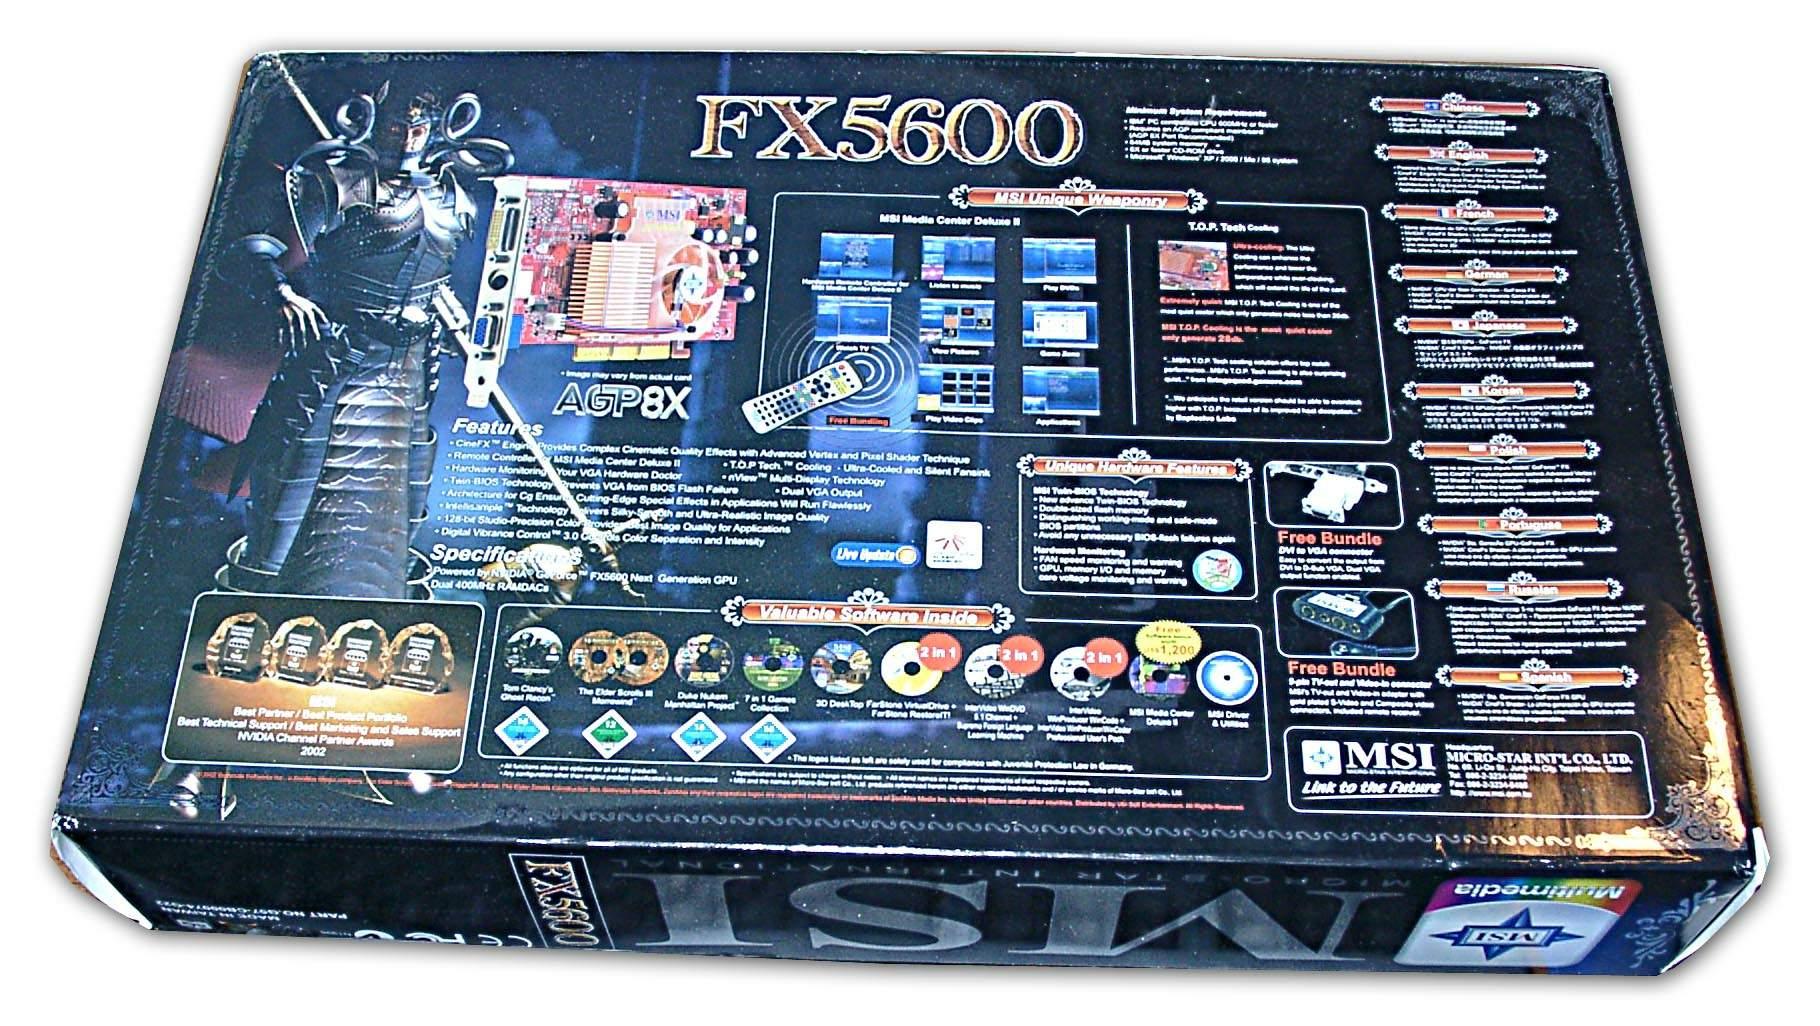 Fx5600 vtdr128 ms 8912 128mb на базе nvidia geforce fx 5600